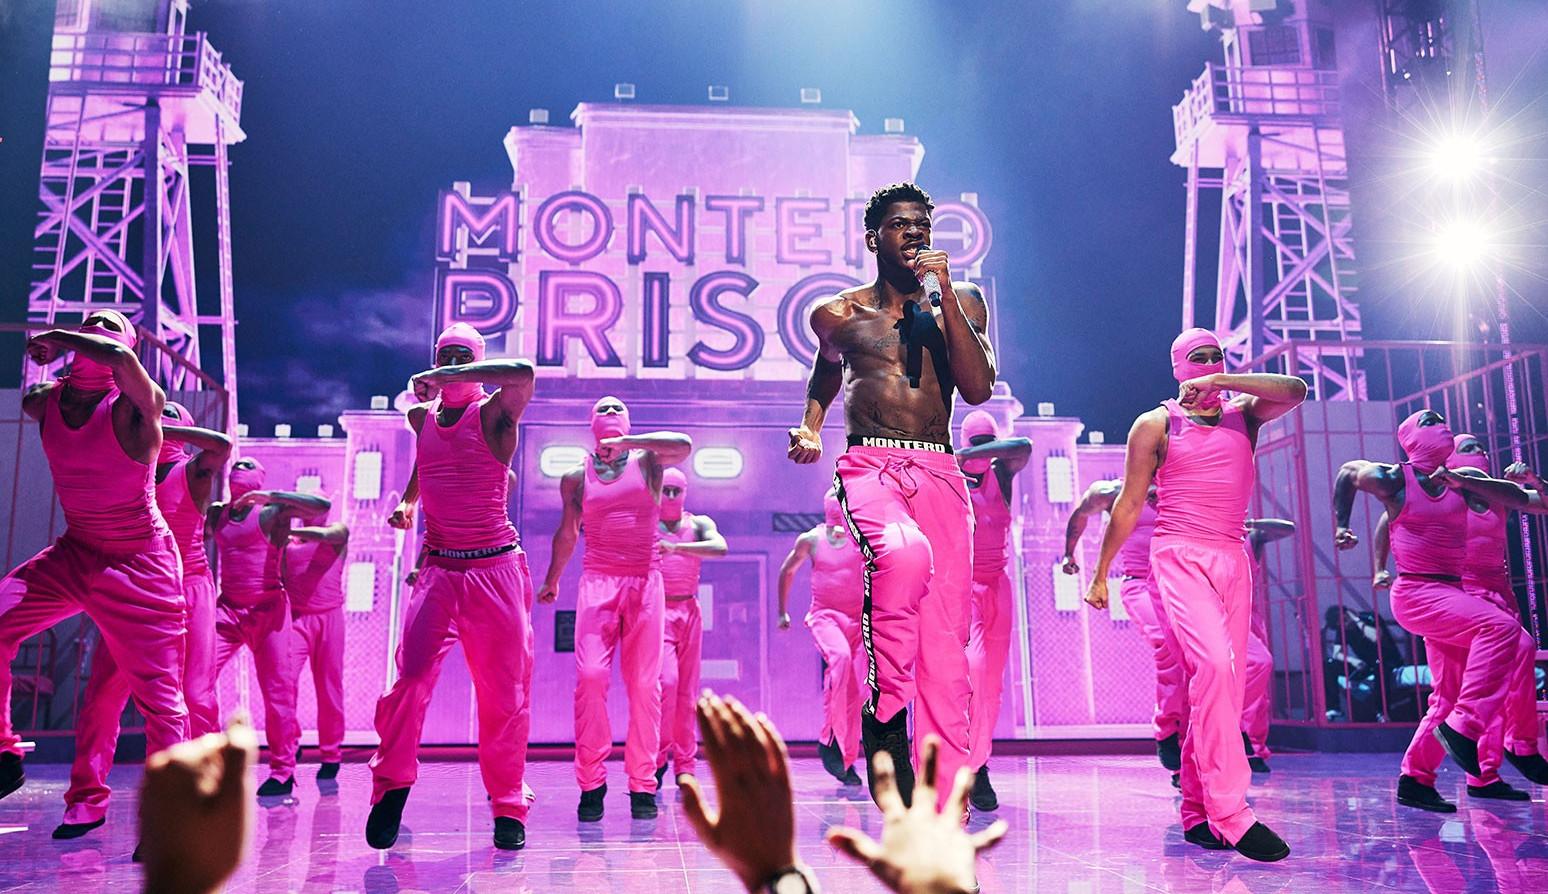 VMA 2021: Lil Nas X faz história ao performar 'Industry Baby' ao lado de Jack Harlow